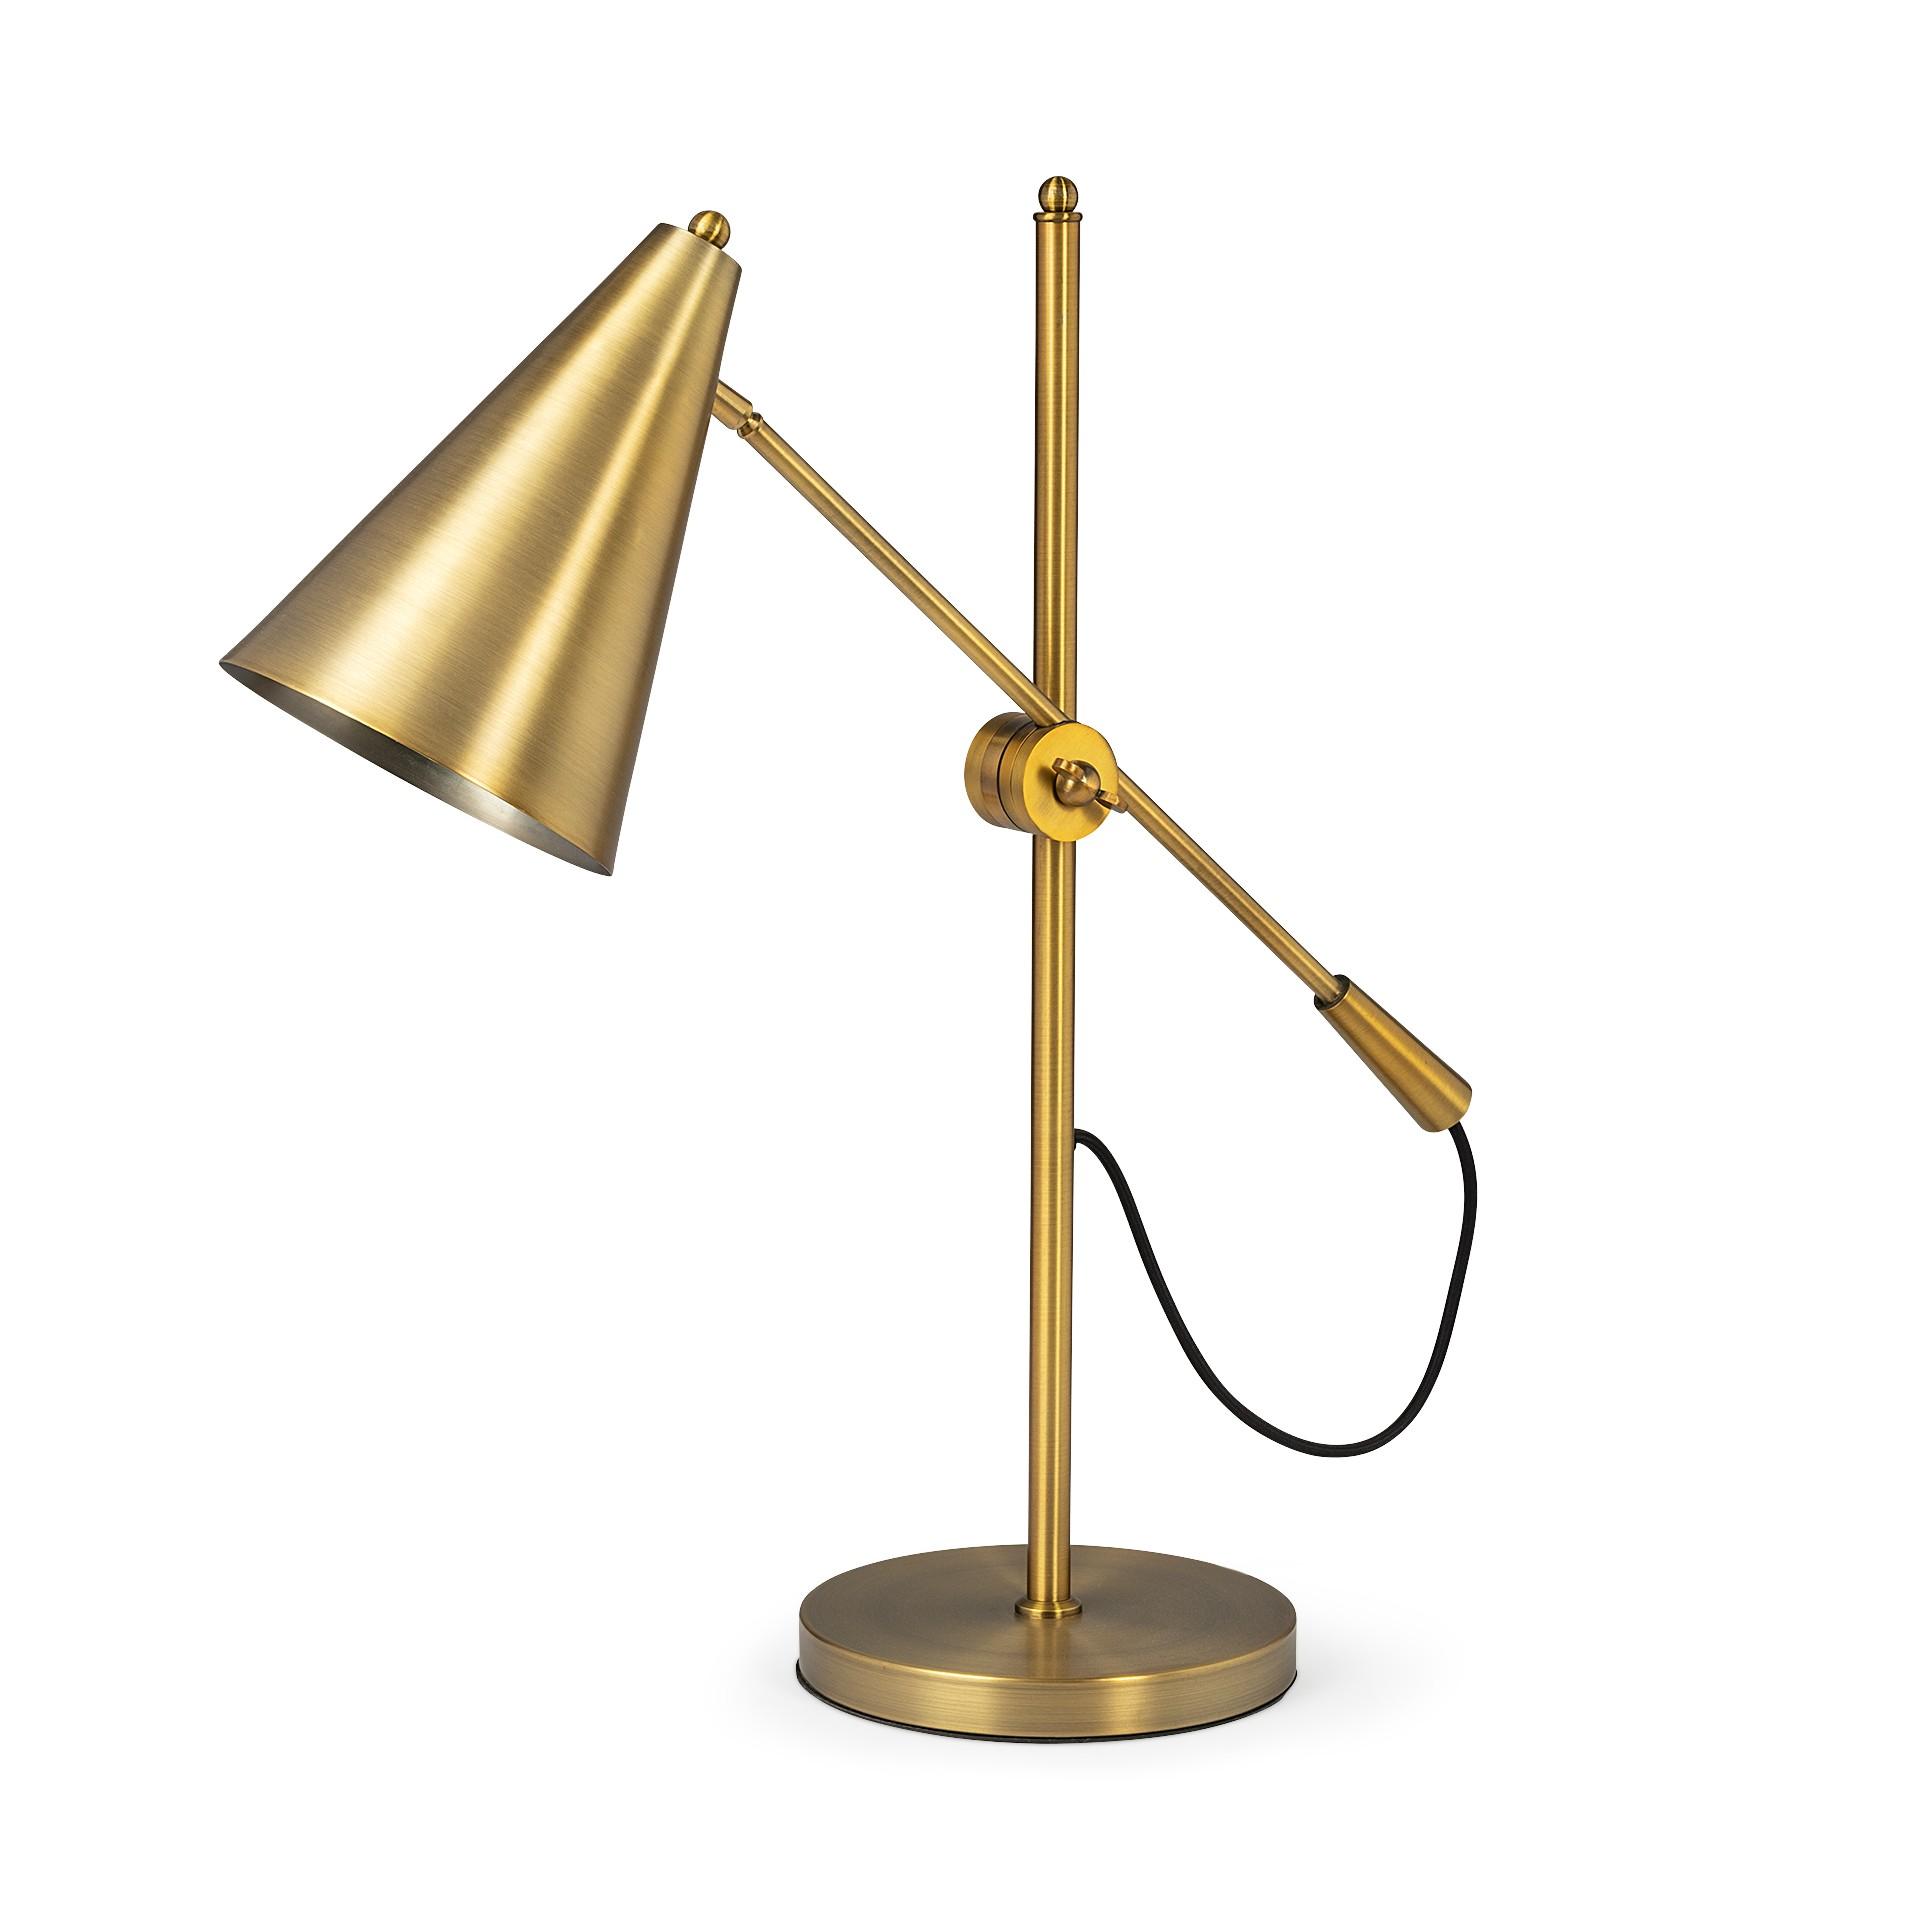 Sleek Golden Cone Adjustable Table or Desk Lamp